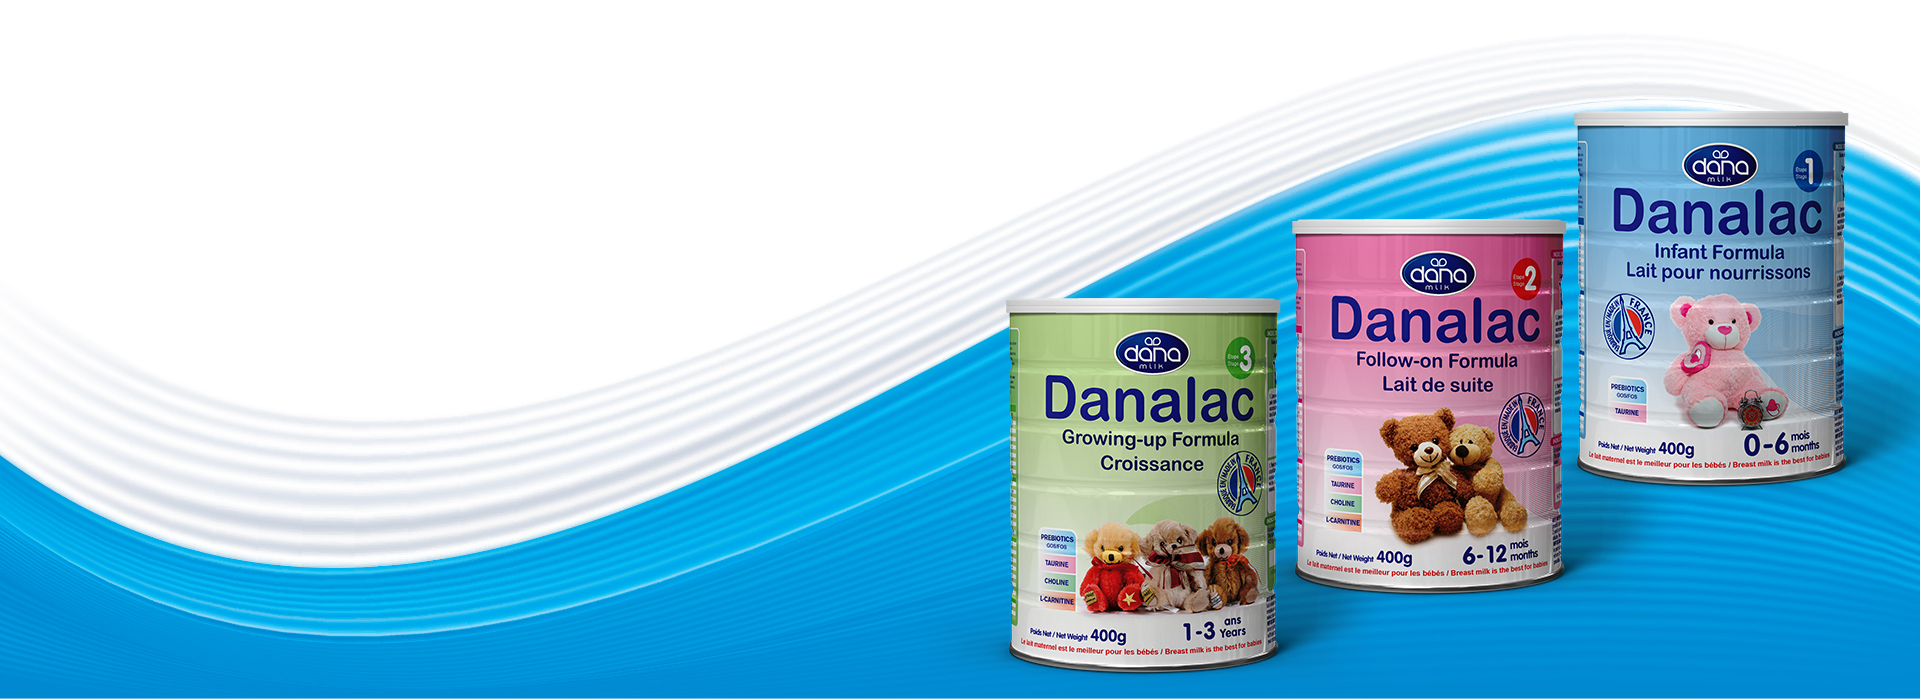 Baby food - Infent Formula - Cereal - Biscuit - Baby milk powder